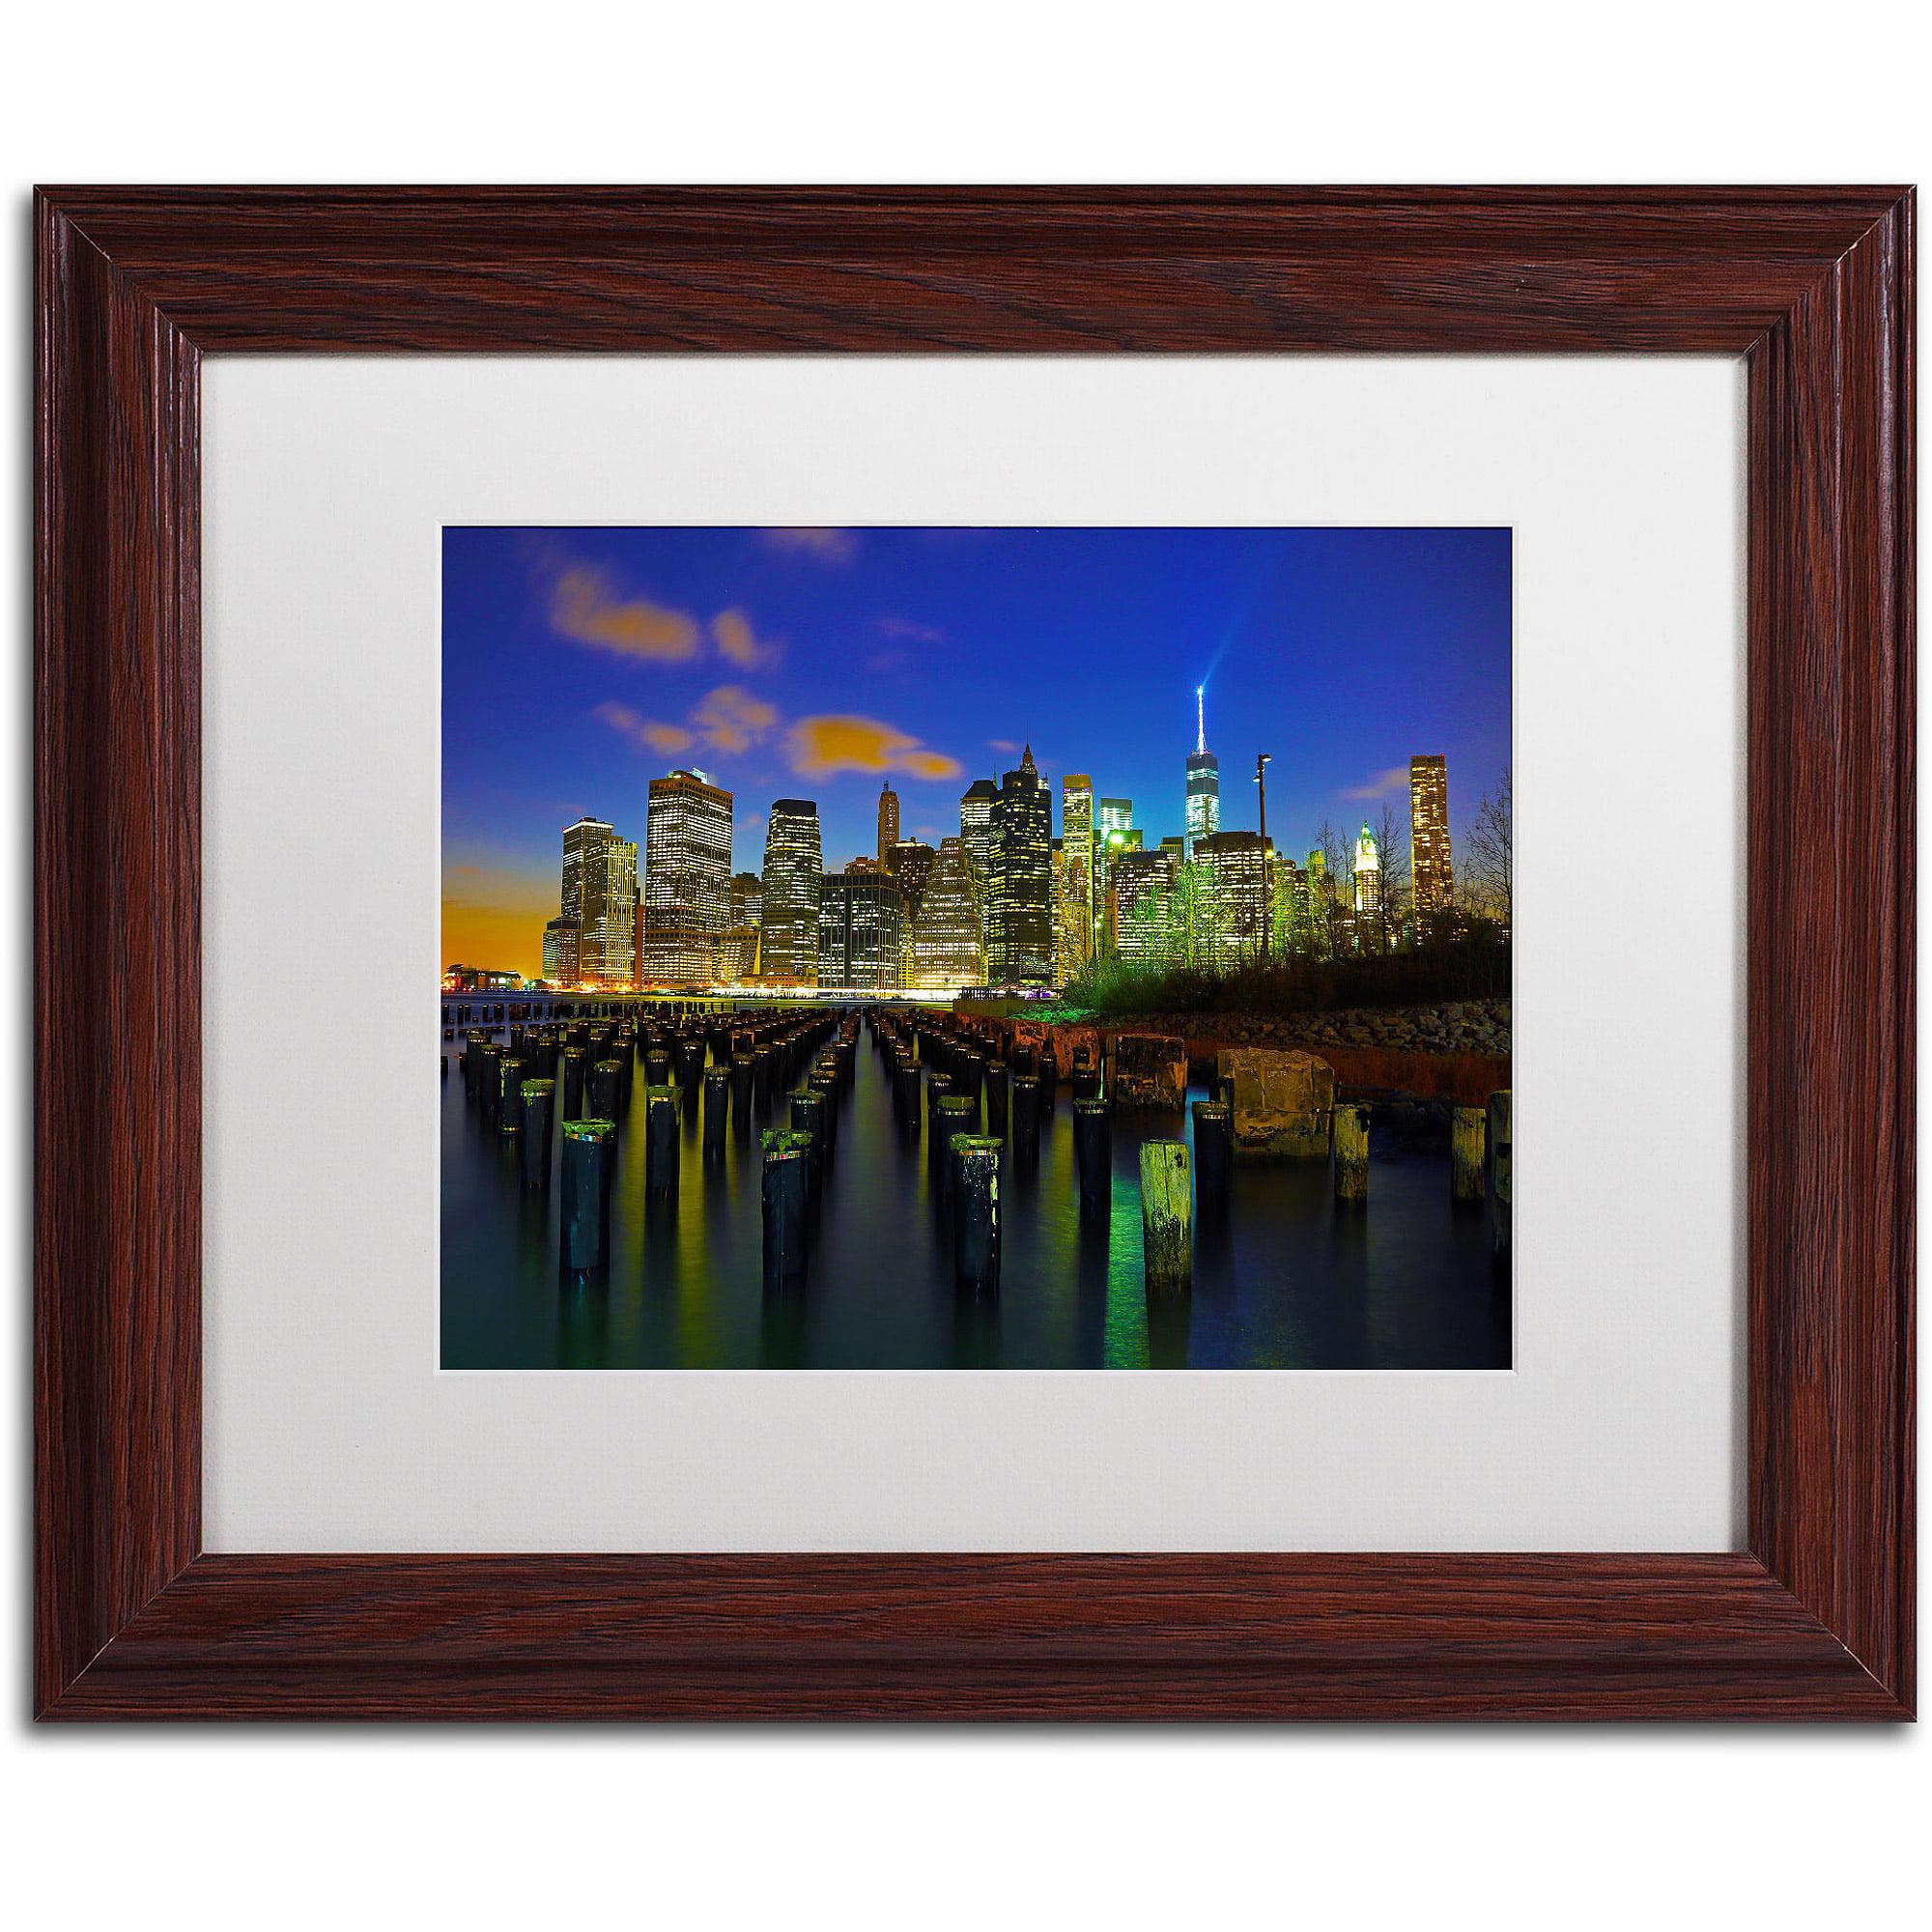 "Trademark Fine Art ""City Lights 1"" Canvas Art by CATeyes, White Matte, Wood Frame"